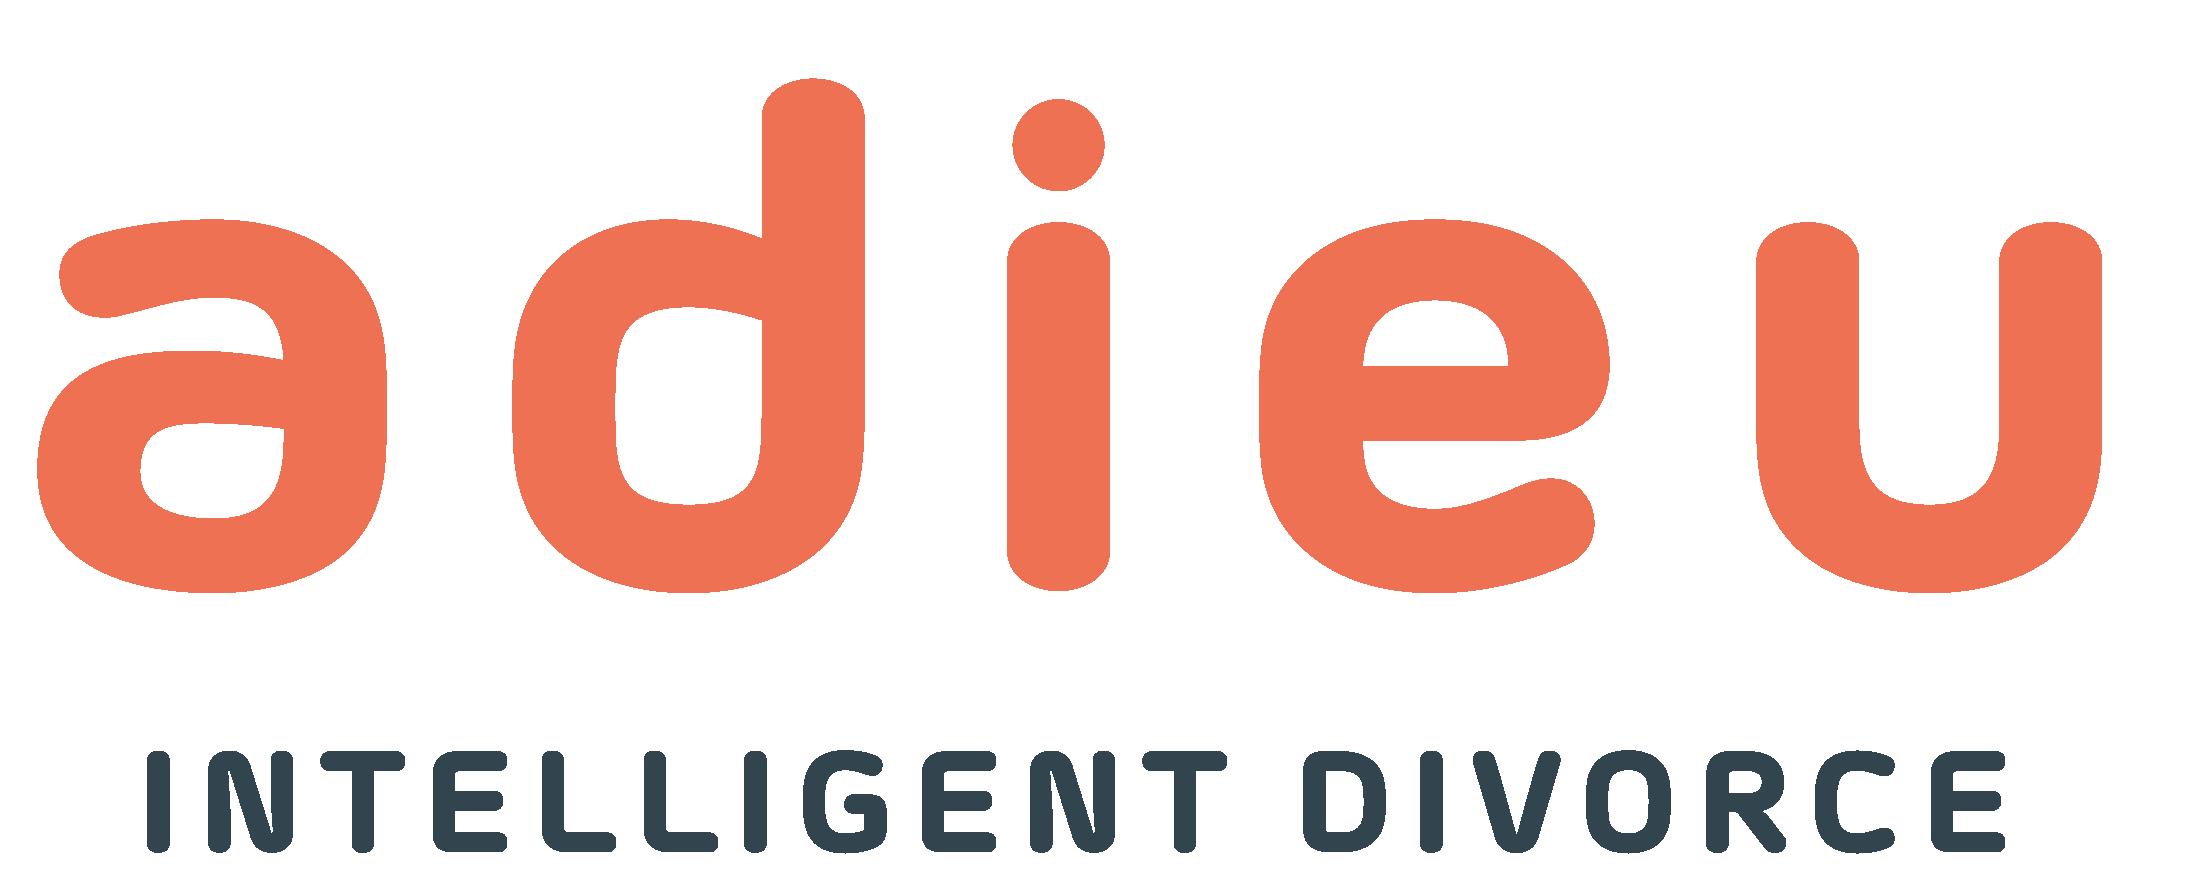 Adieu – Intelligent Divorce